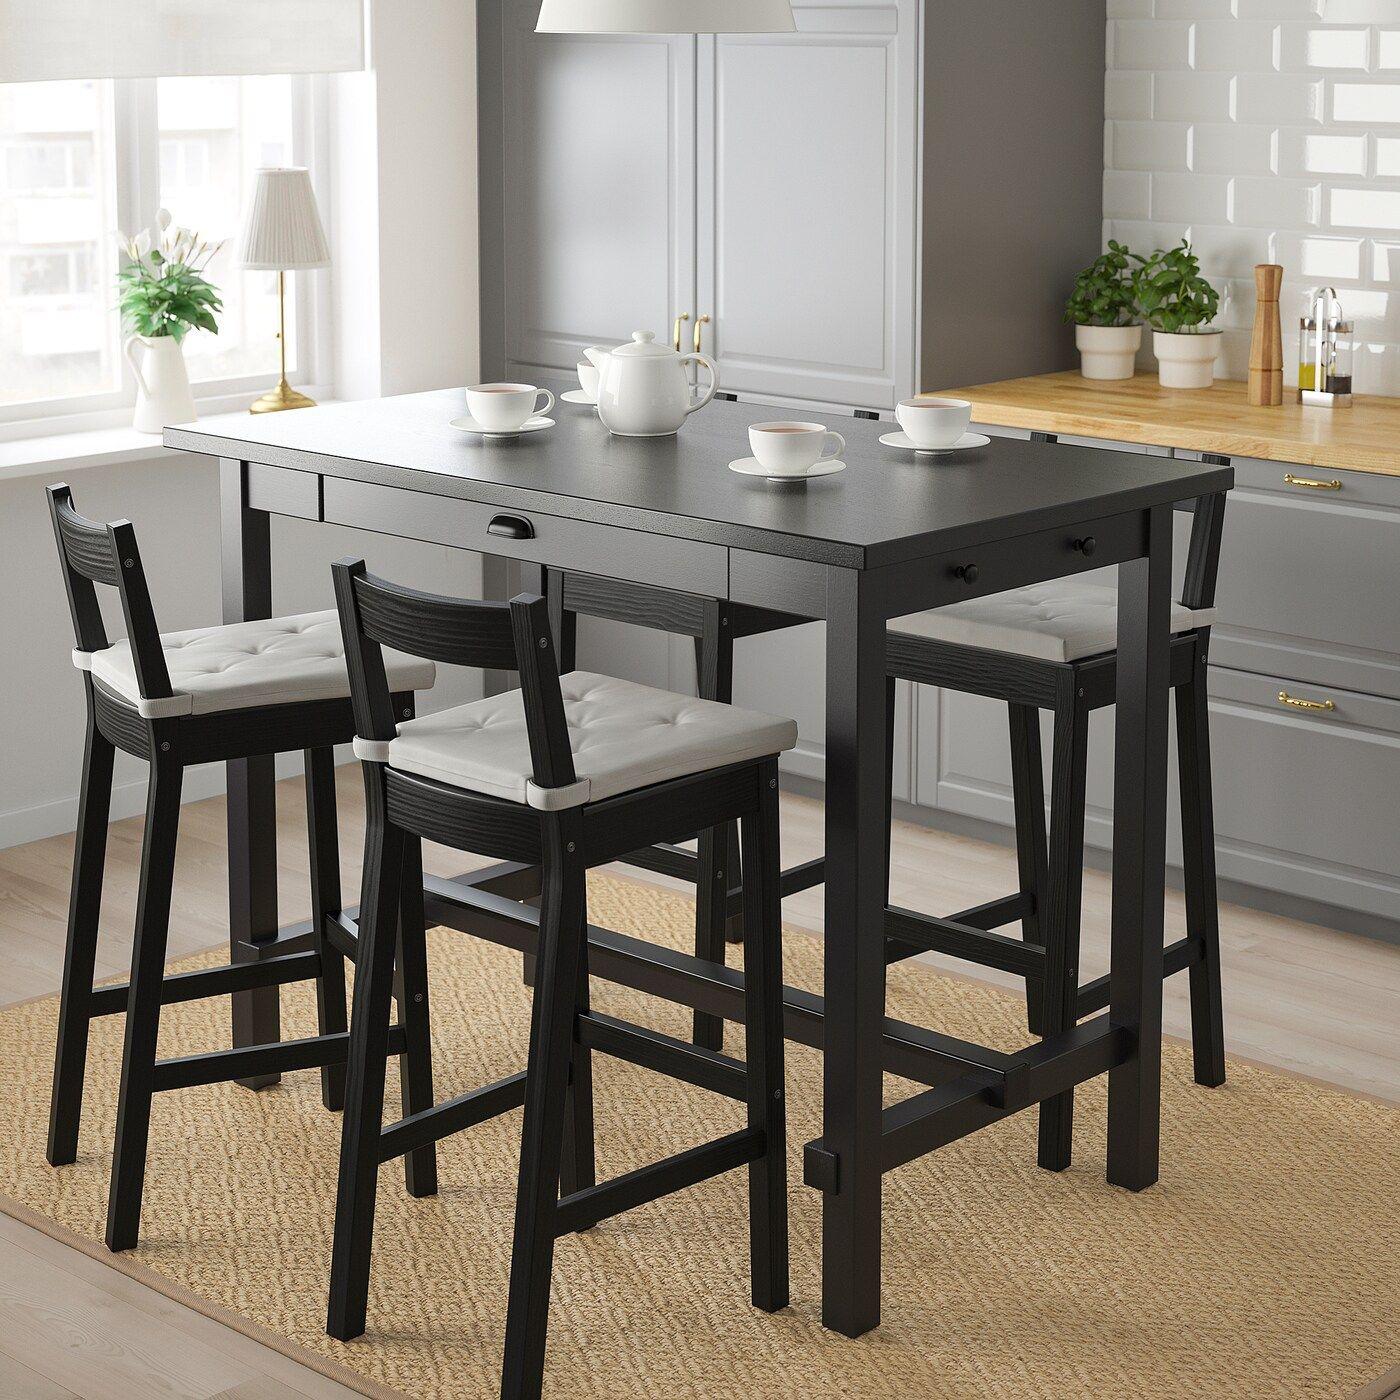 NORDVIKEN / NORDVIKEN Theke + 9 Barstühle   schwarz/schwarz   IKEA ...